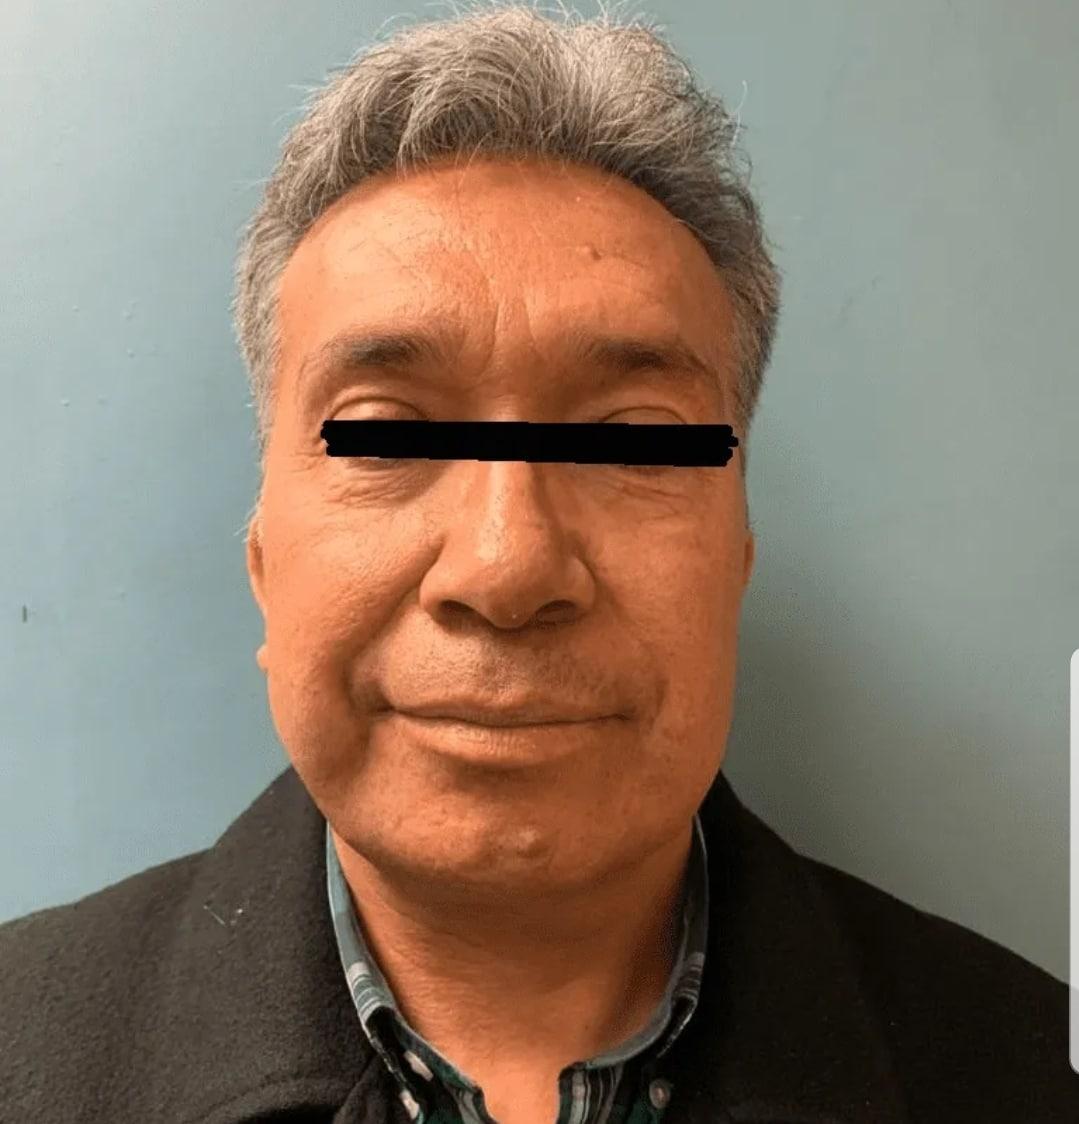 Imputan a sacerdote pederasta en Baja California